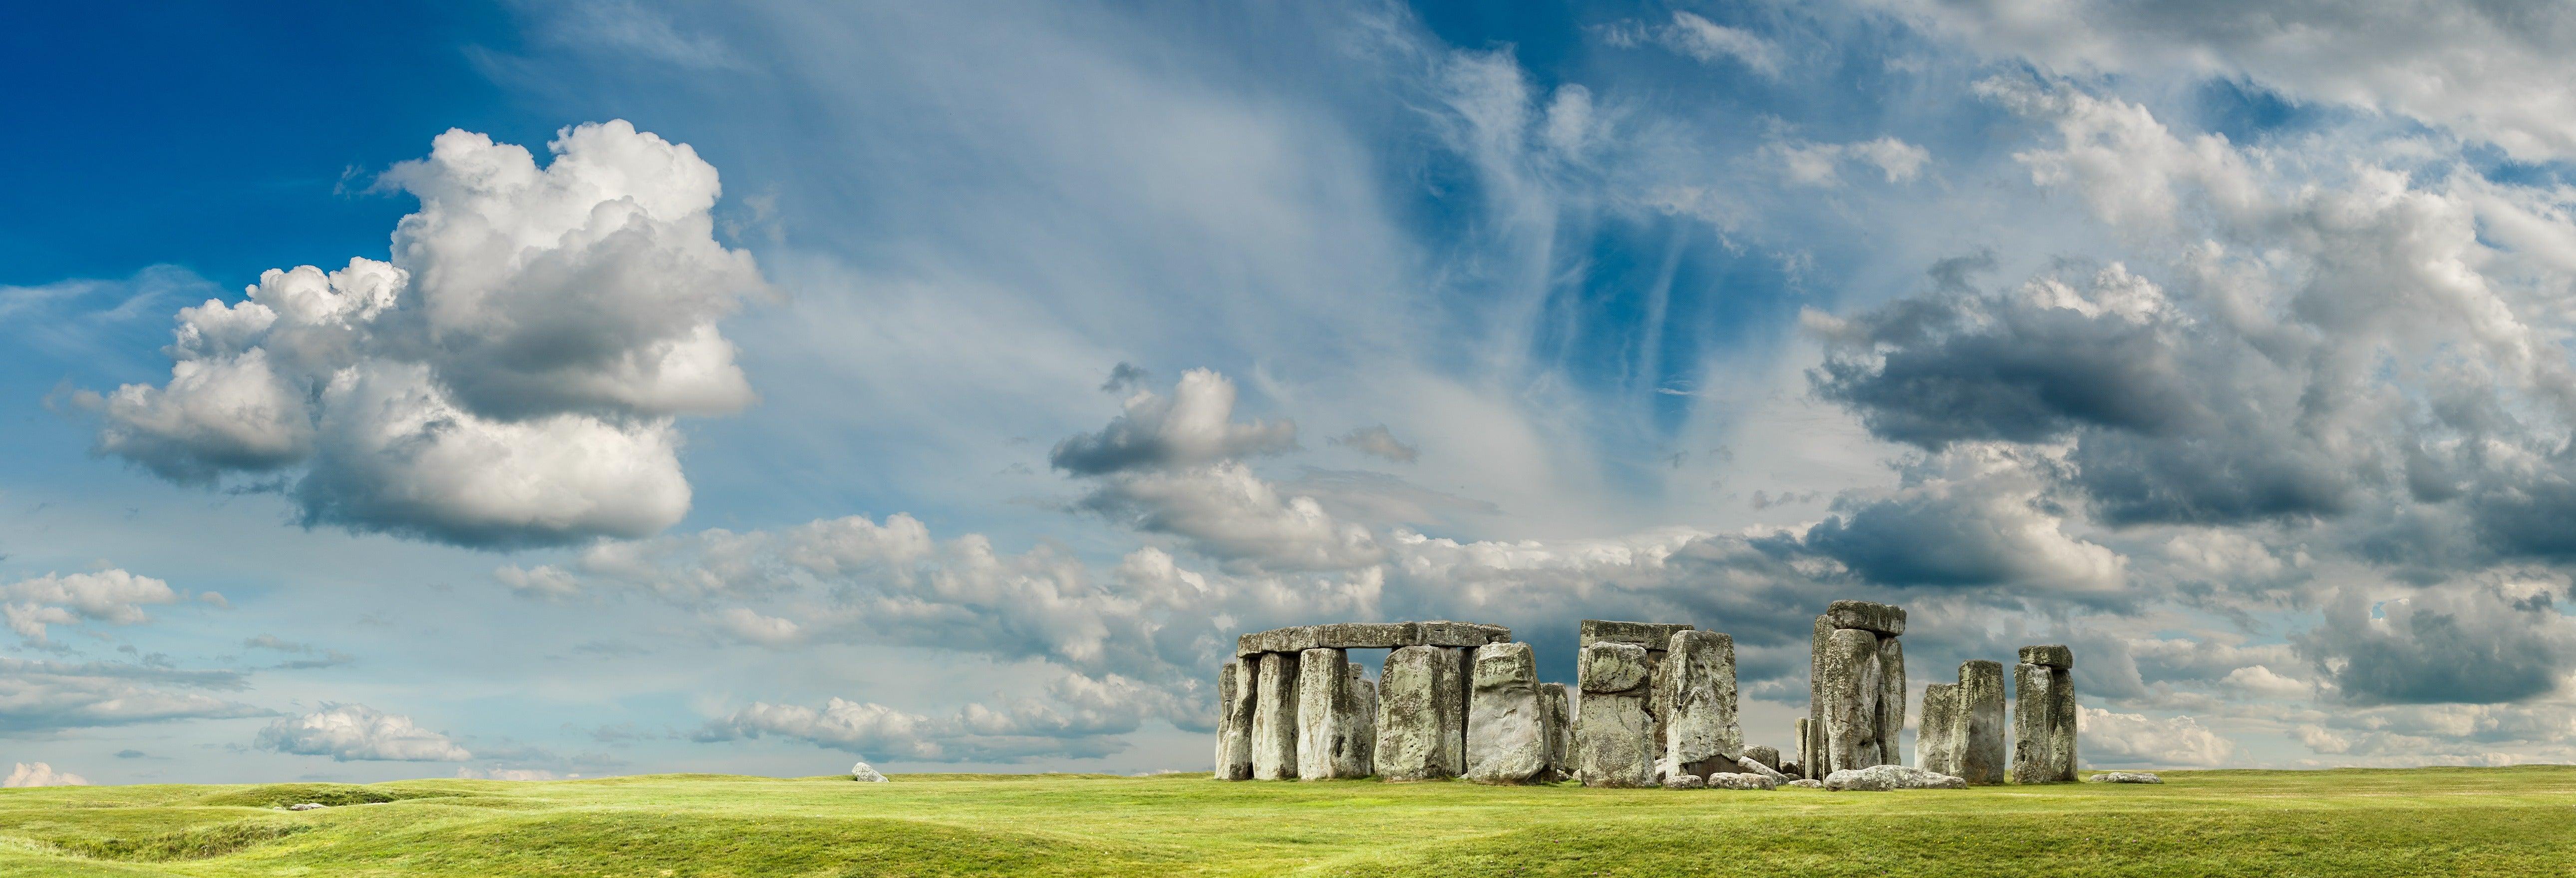 Bath & Stonehenge Day Trip